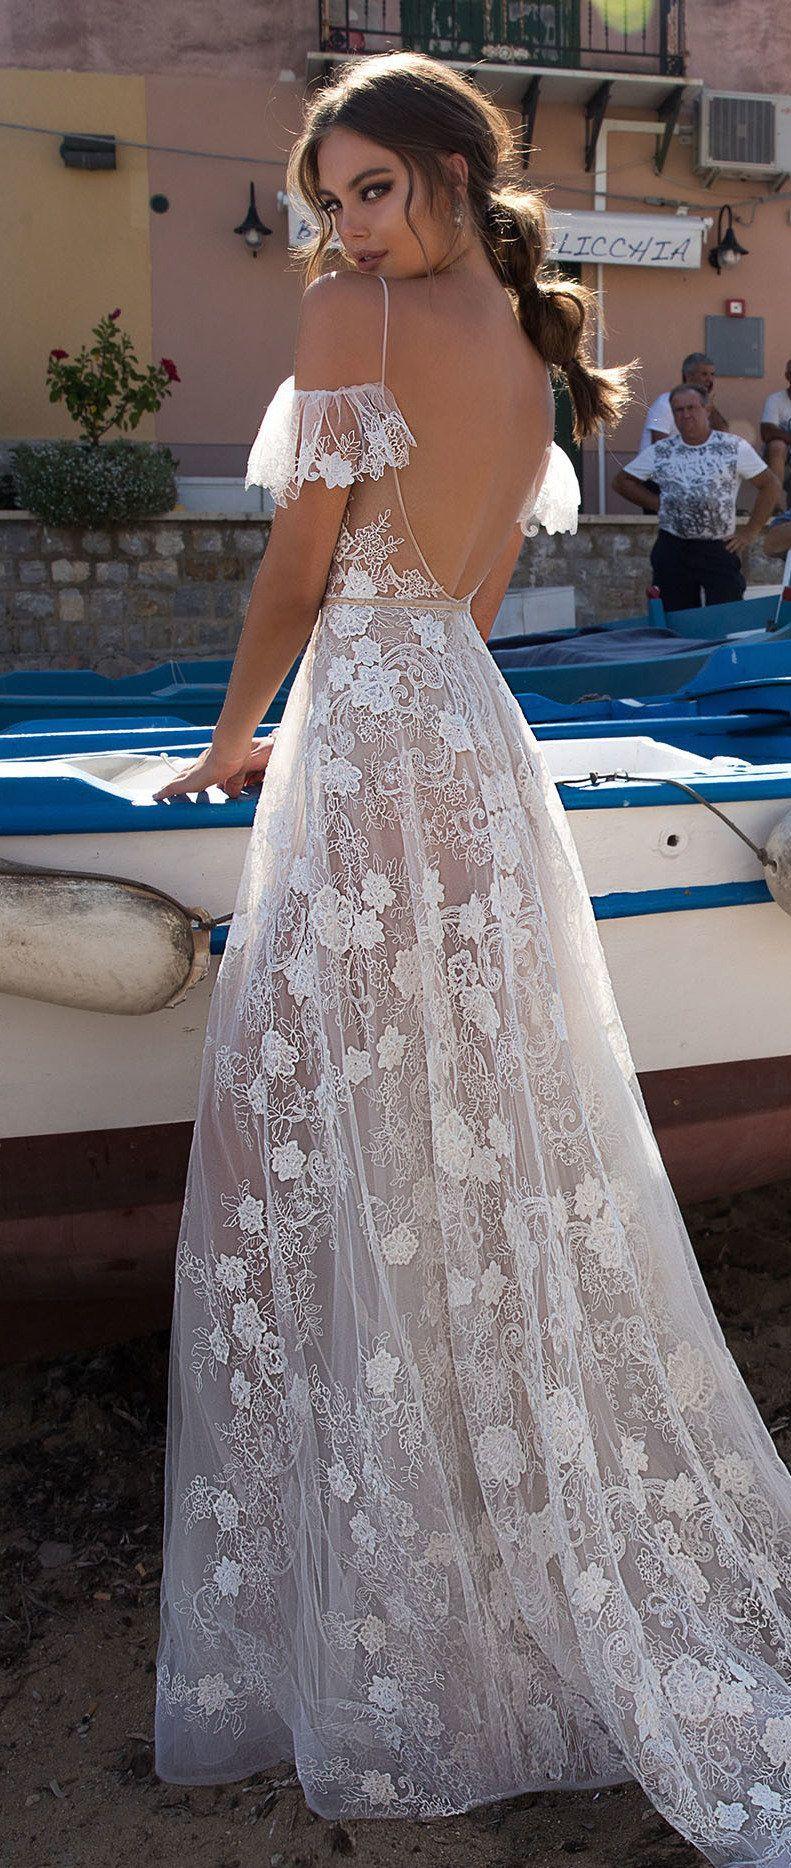 MUSE by Berta : Sicily Wedding Dress Collection | Brautkleid ...